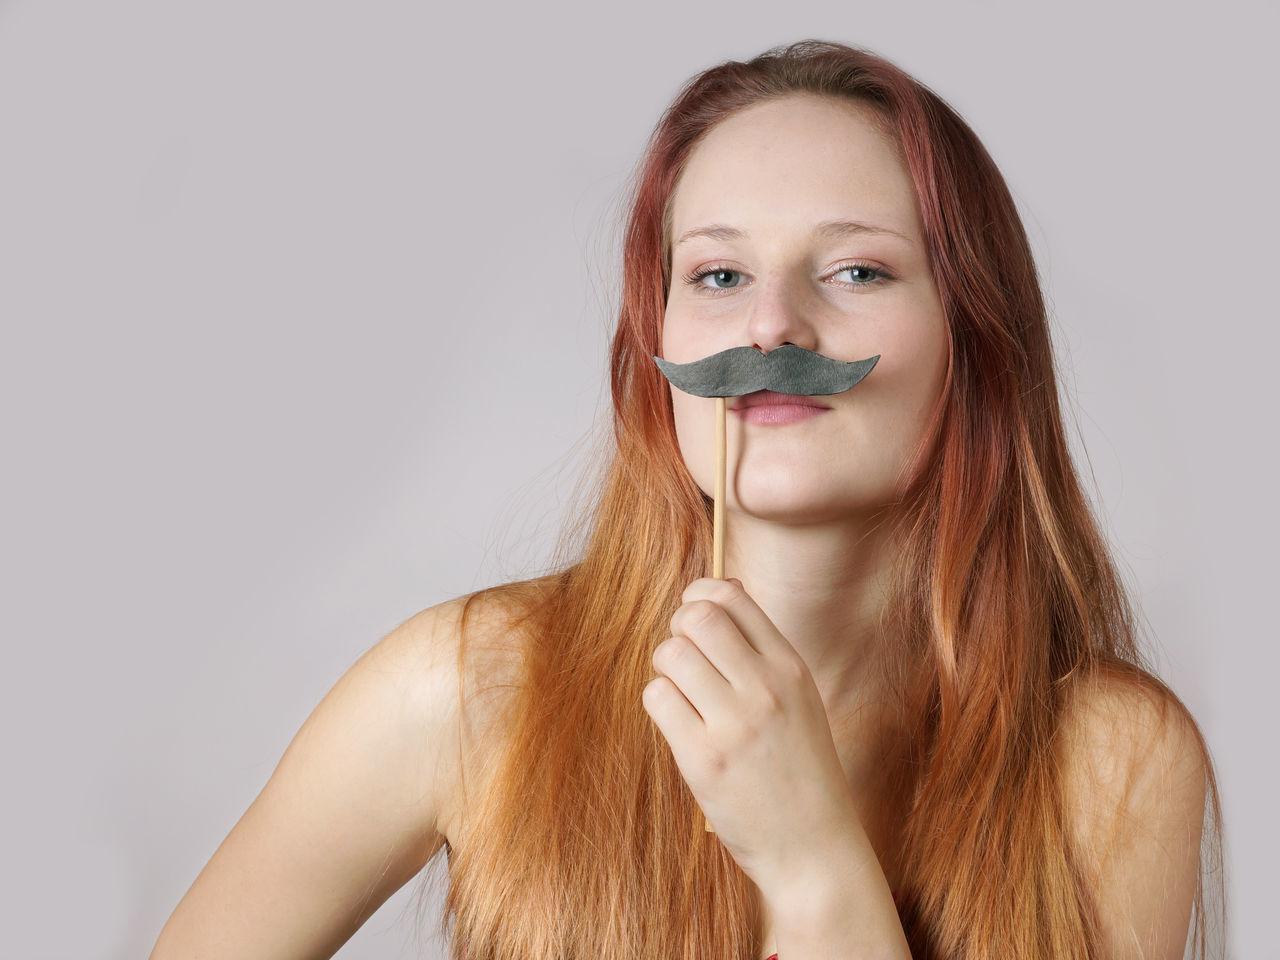 Beautiful stock photos of schnurrbart,  18-19 Years,  Attitude,  Blond Hair,  Caucasian Ethnicity